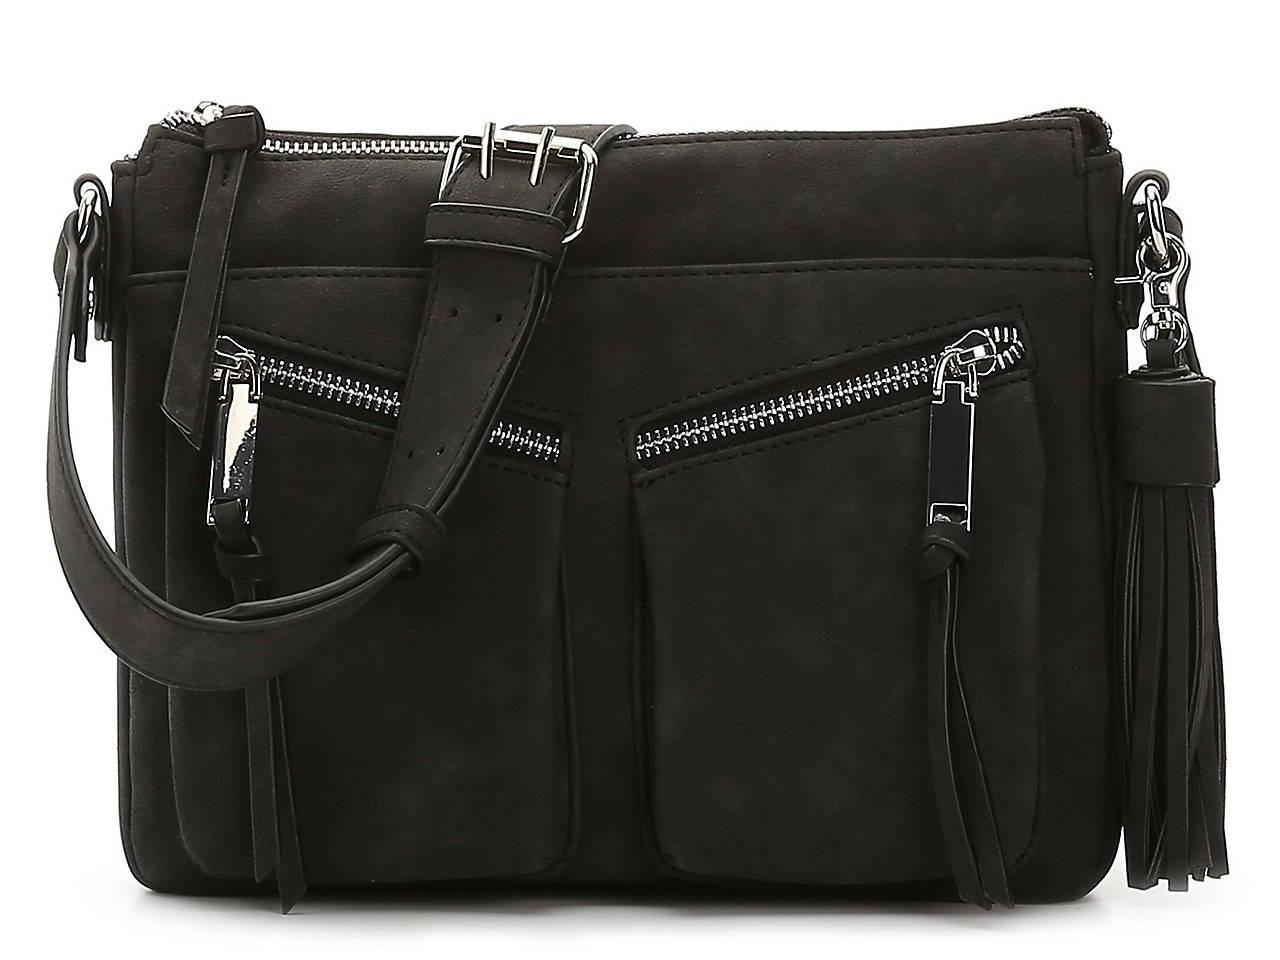 7df1ad92df39 Violet Ray Raven Tassel Crossbody Bag Women s Handbags   Accessories ...